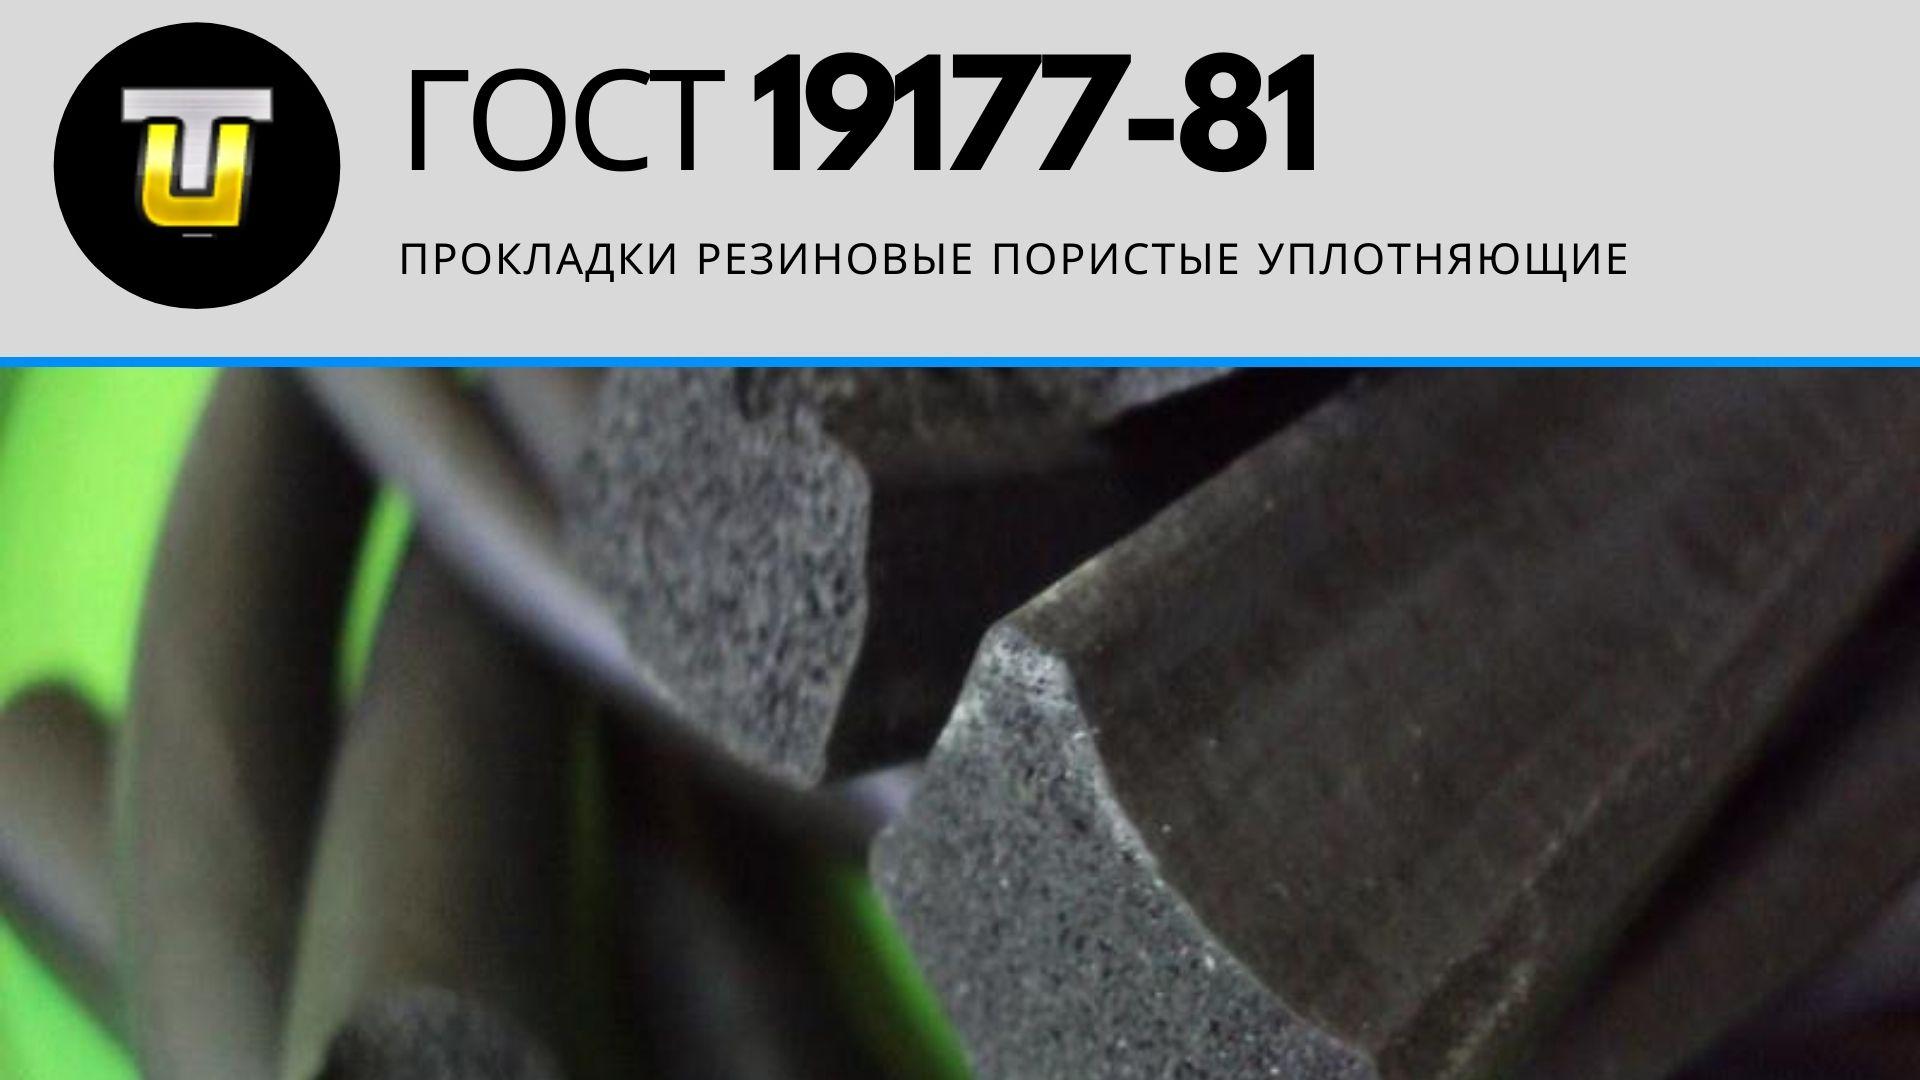 ГОСТ 19177-81